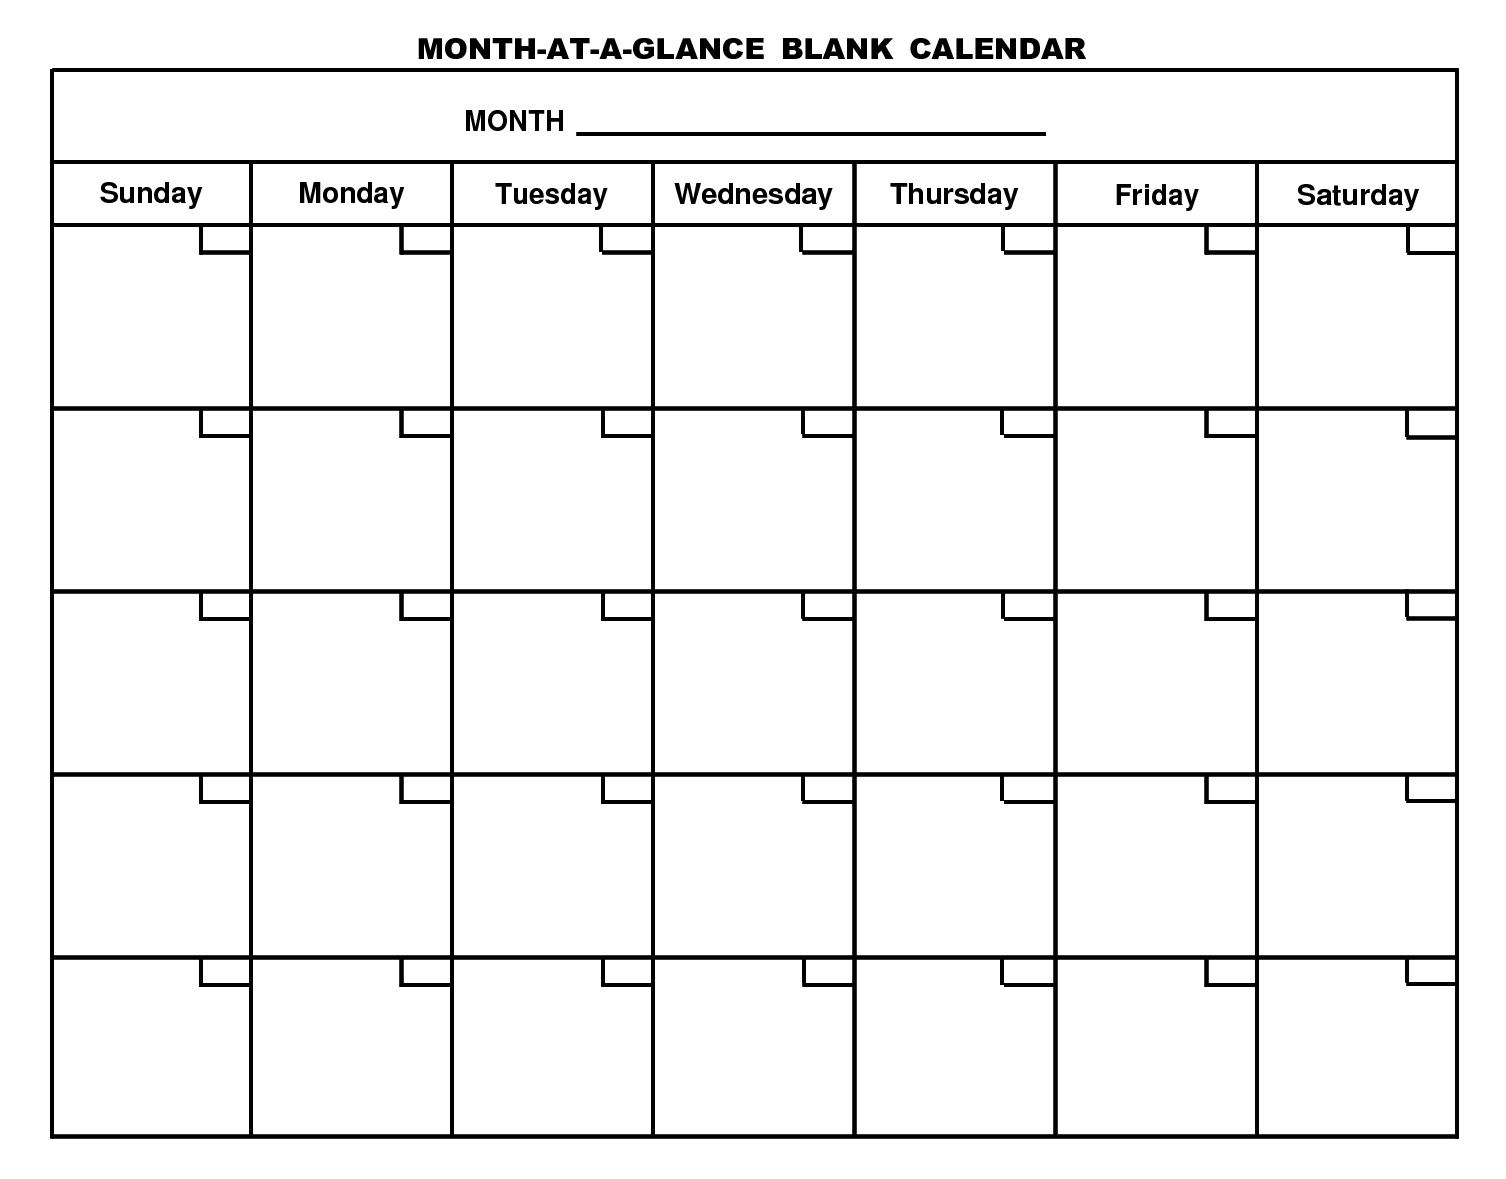 Printable Blank Ndar Template E2 80 A6 Organizing Pinte Monthly Menu pertaining to Monthly Printable Blank Menus To Print